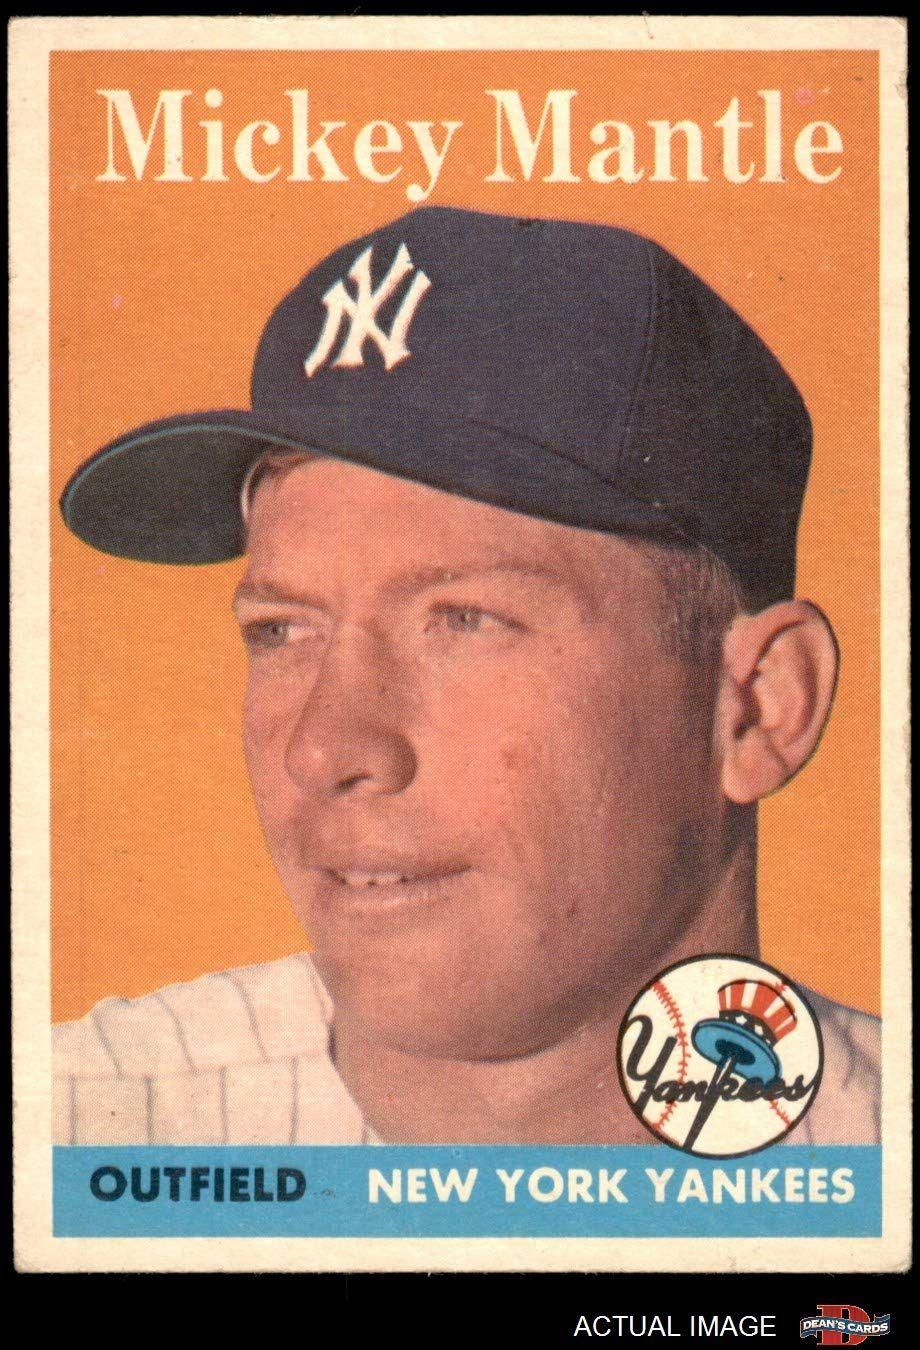 1958 topps 150 mickey mantle new york yankees baseball